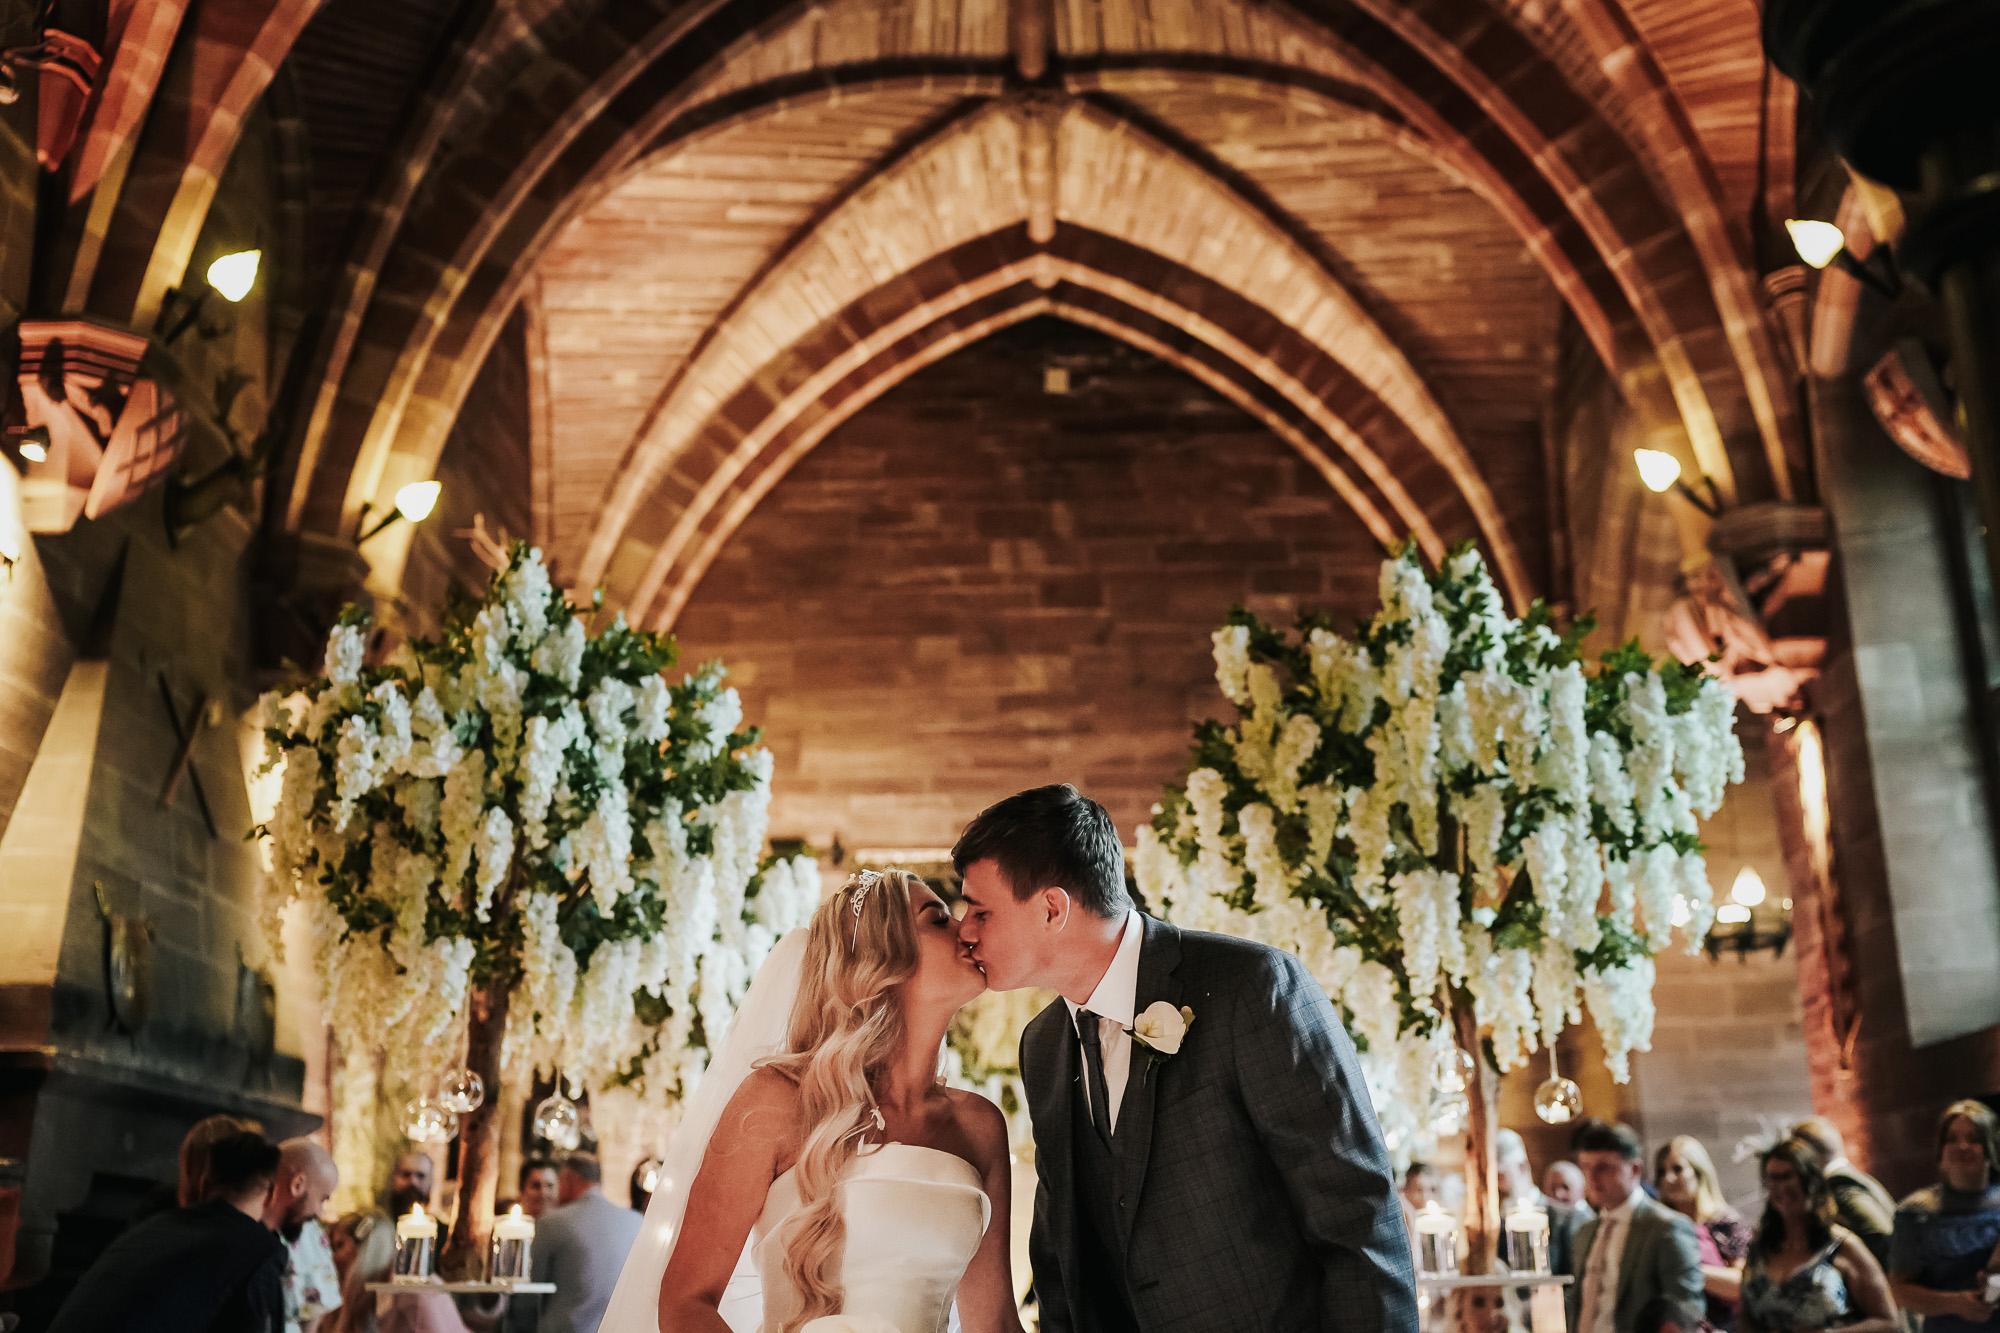 Peckforton Castle wedding photography cheshire wedding photographer (25 of 57).jpg